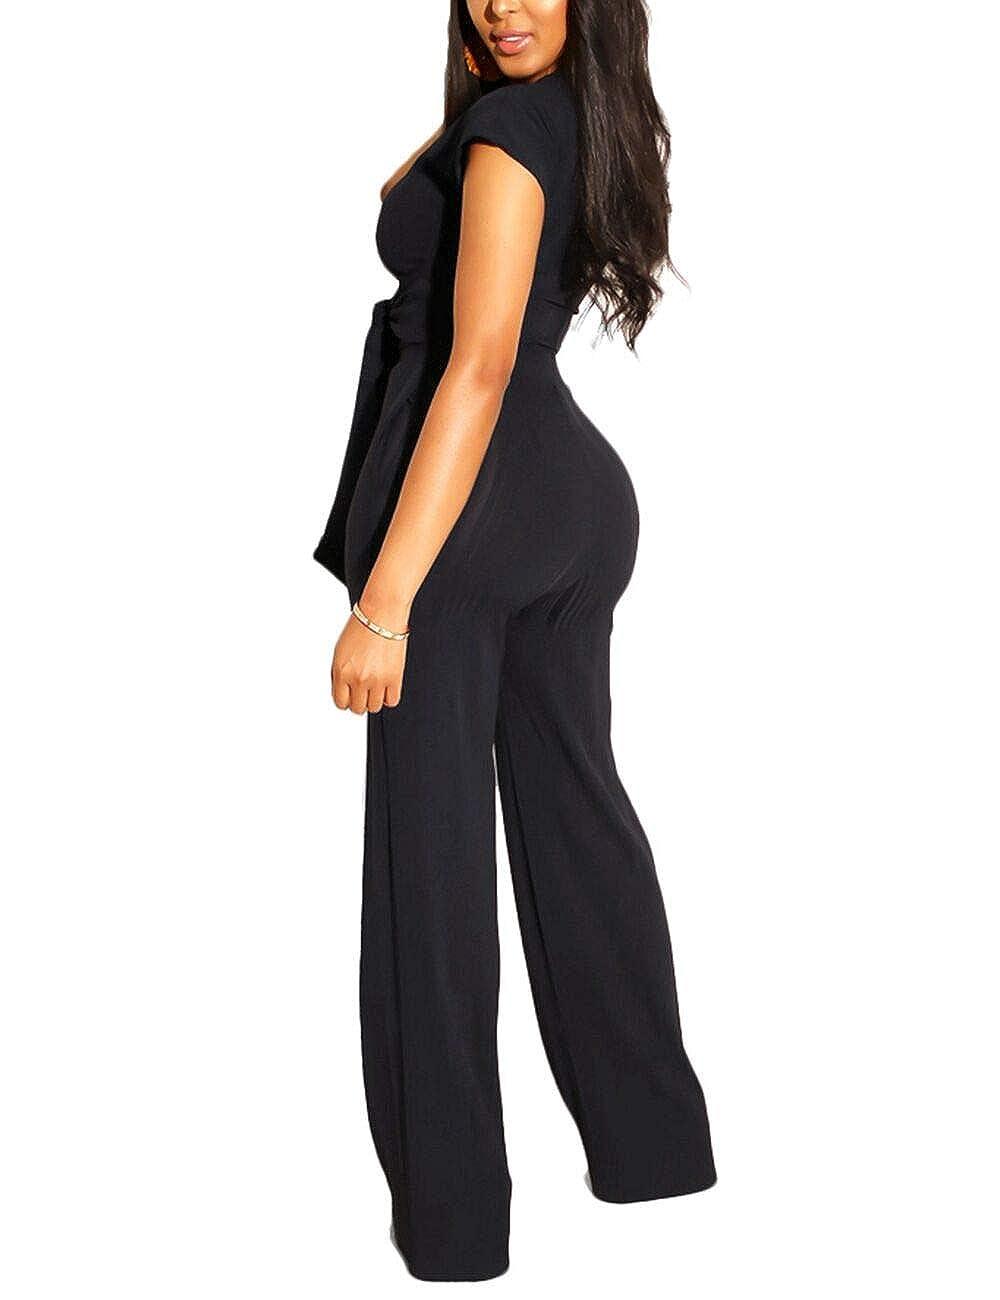 b9965ce744ae Amazon.com: Angsuttc Women Glitter 2 Piece Outfits Sexy Bandage Tie Front  Crop Top + Long Pencil Pants Set: Clothing